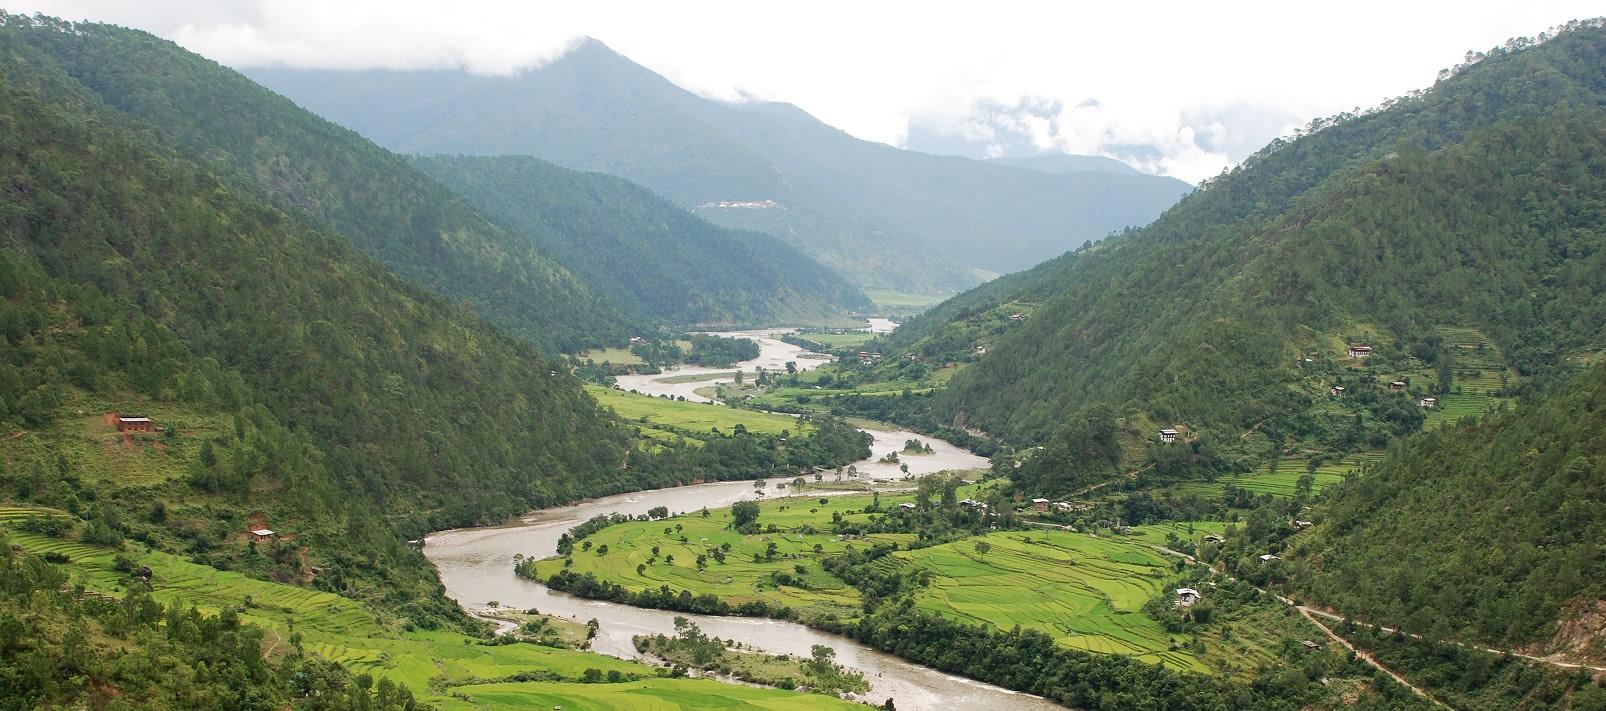 Enchanting Travels Bhutan Tours Punakha Valley 1